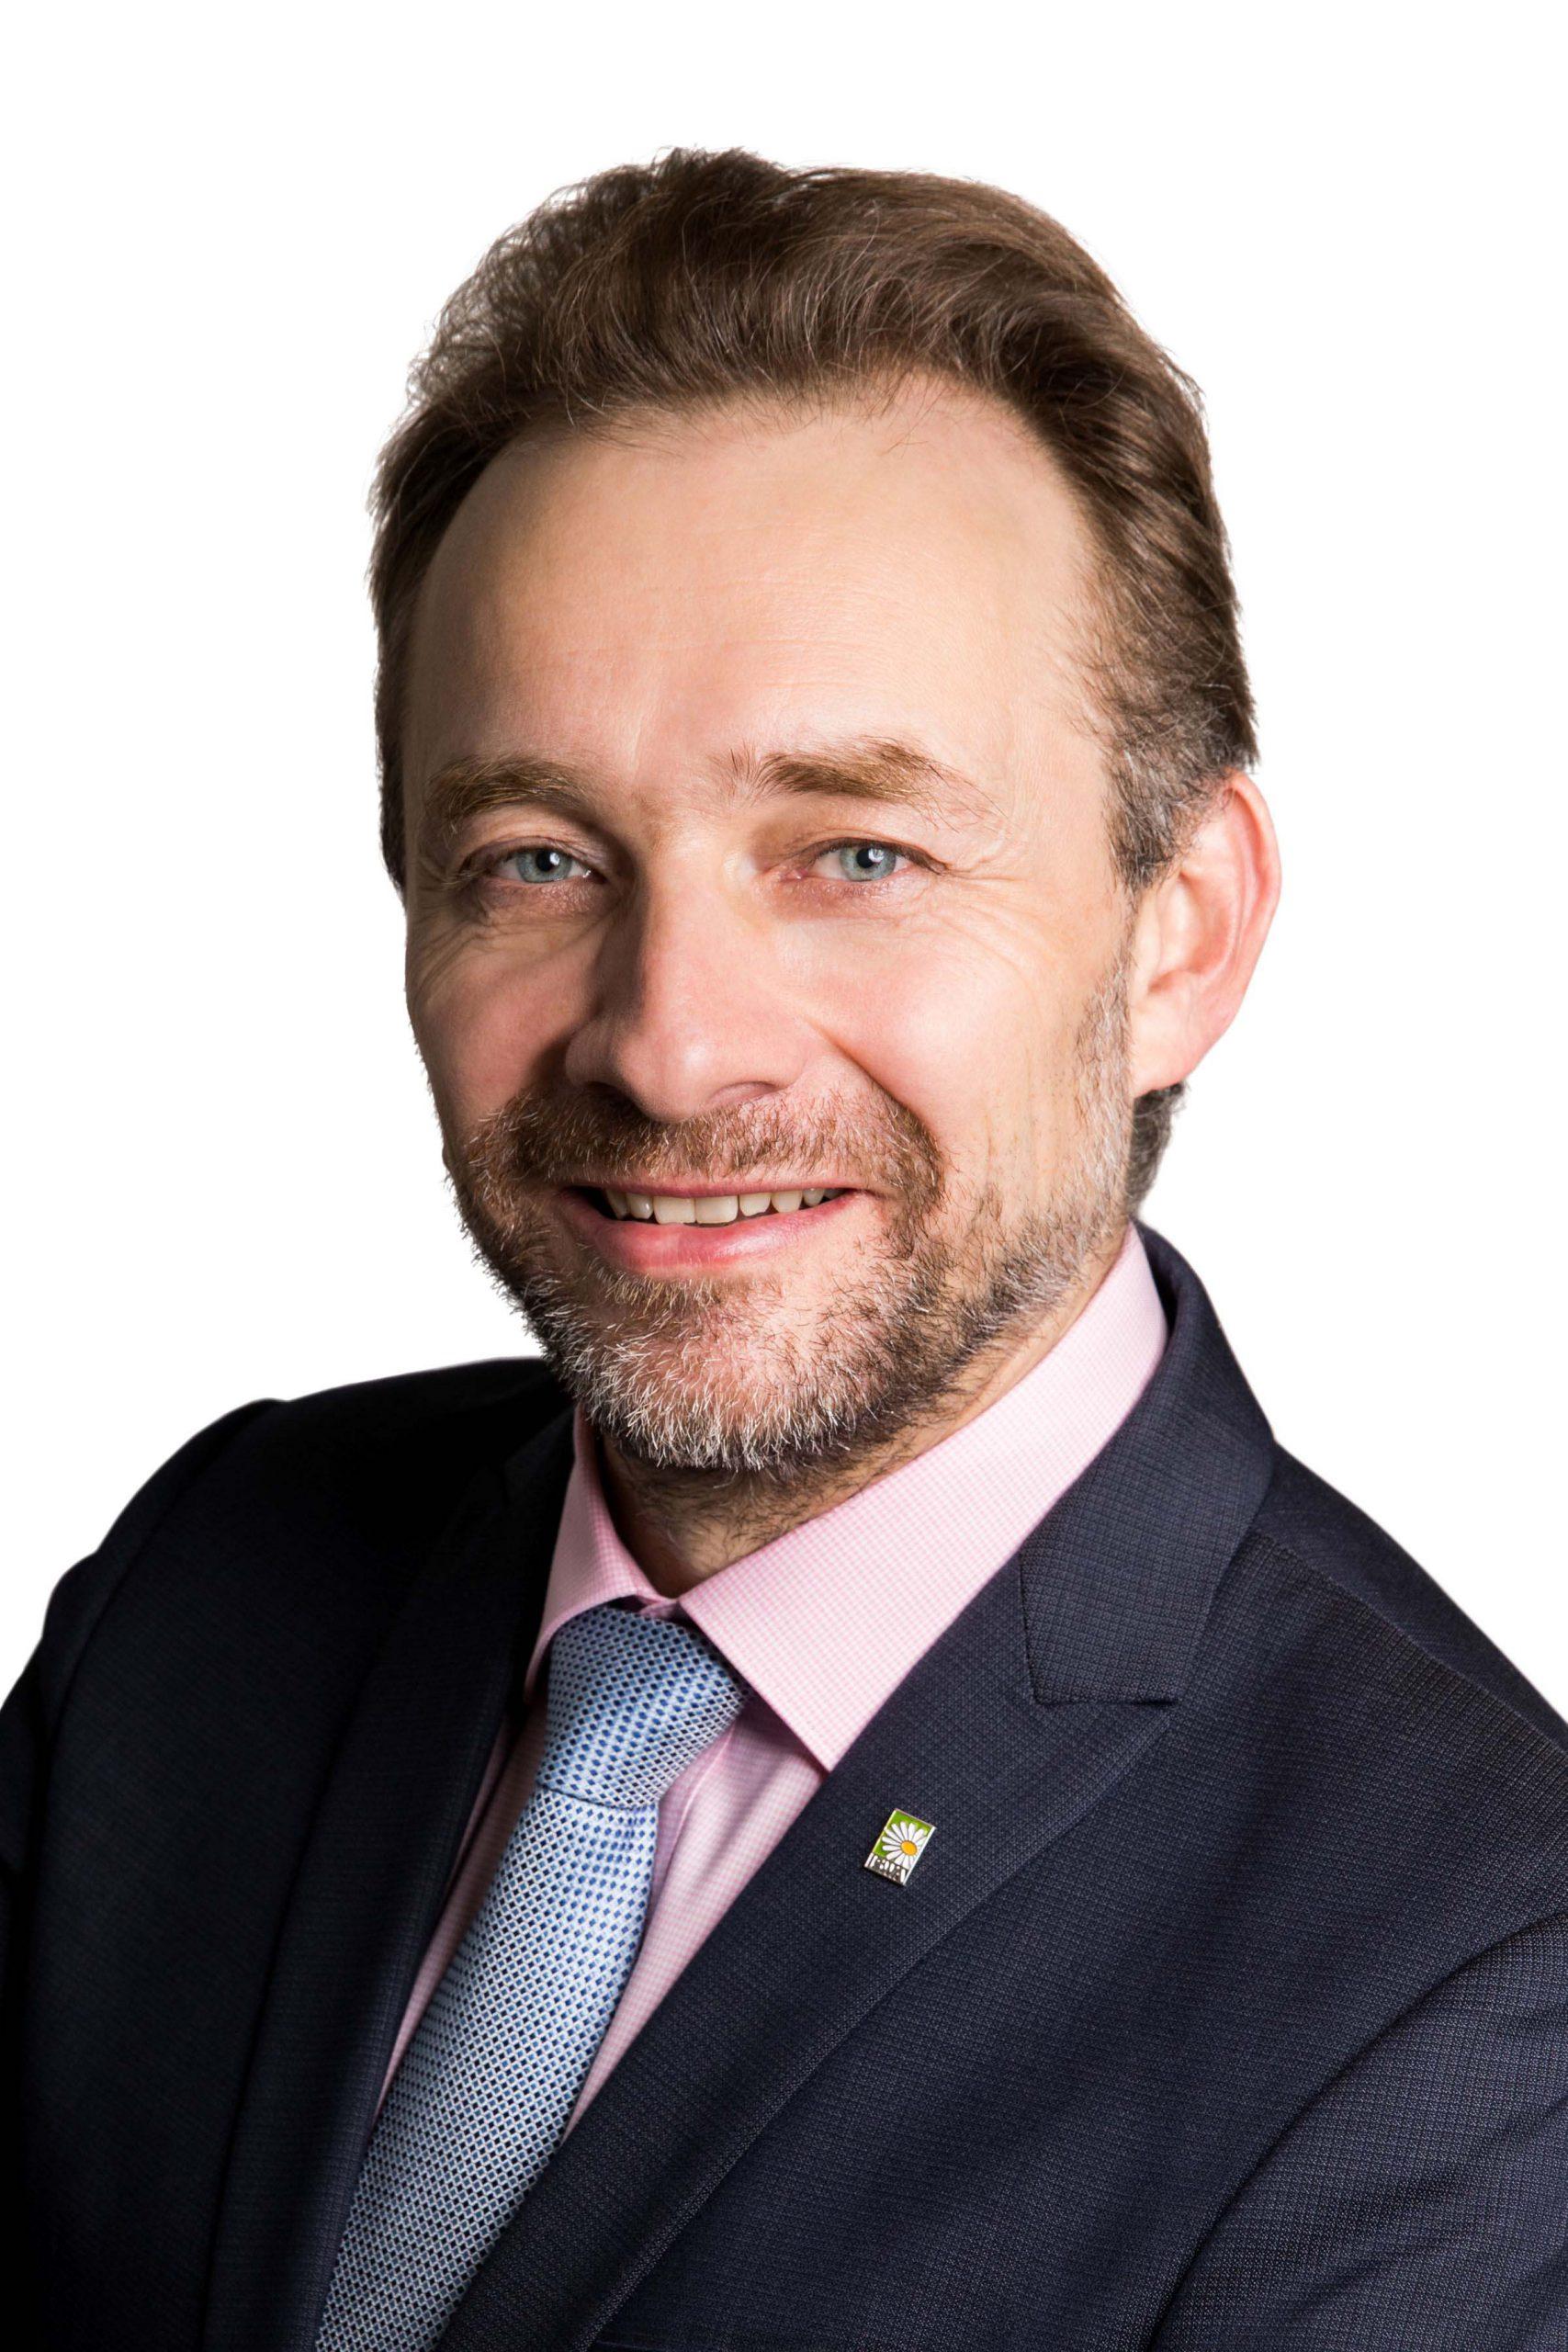 Arne Ragossnig